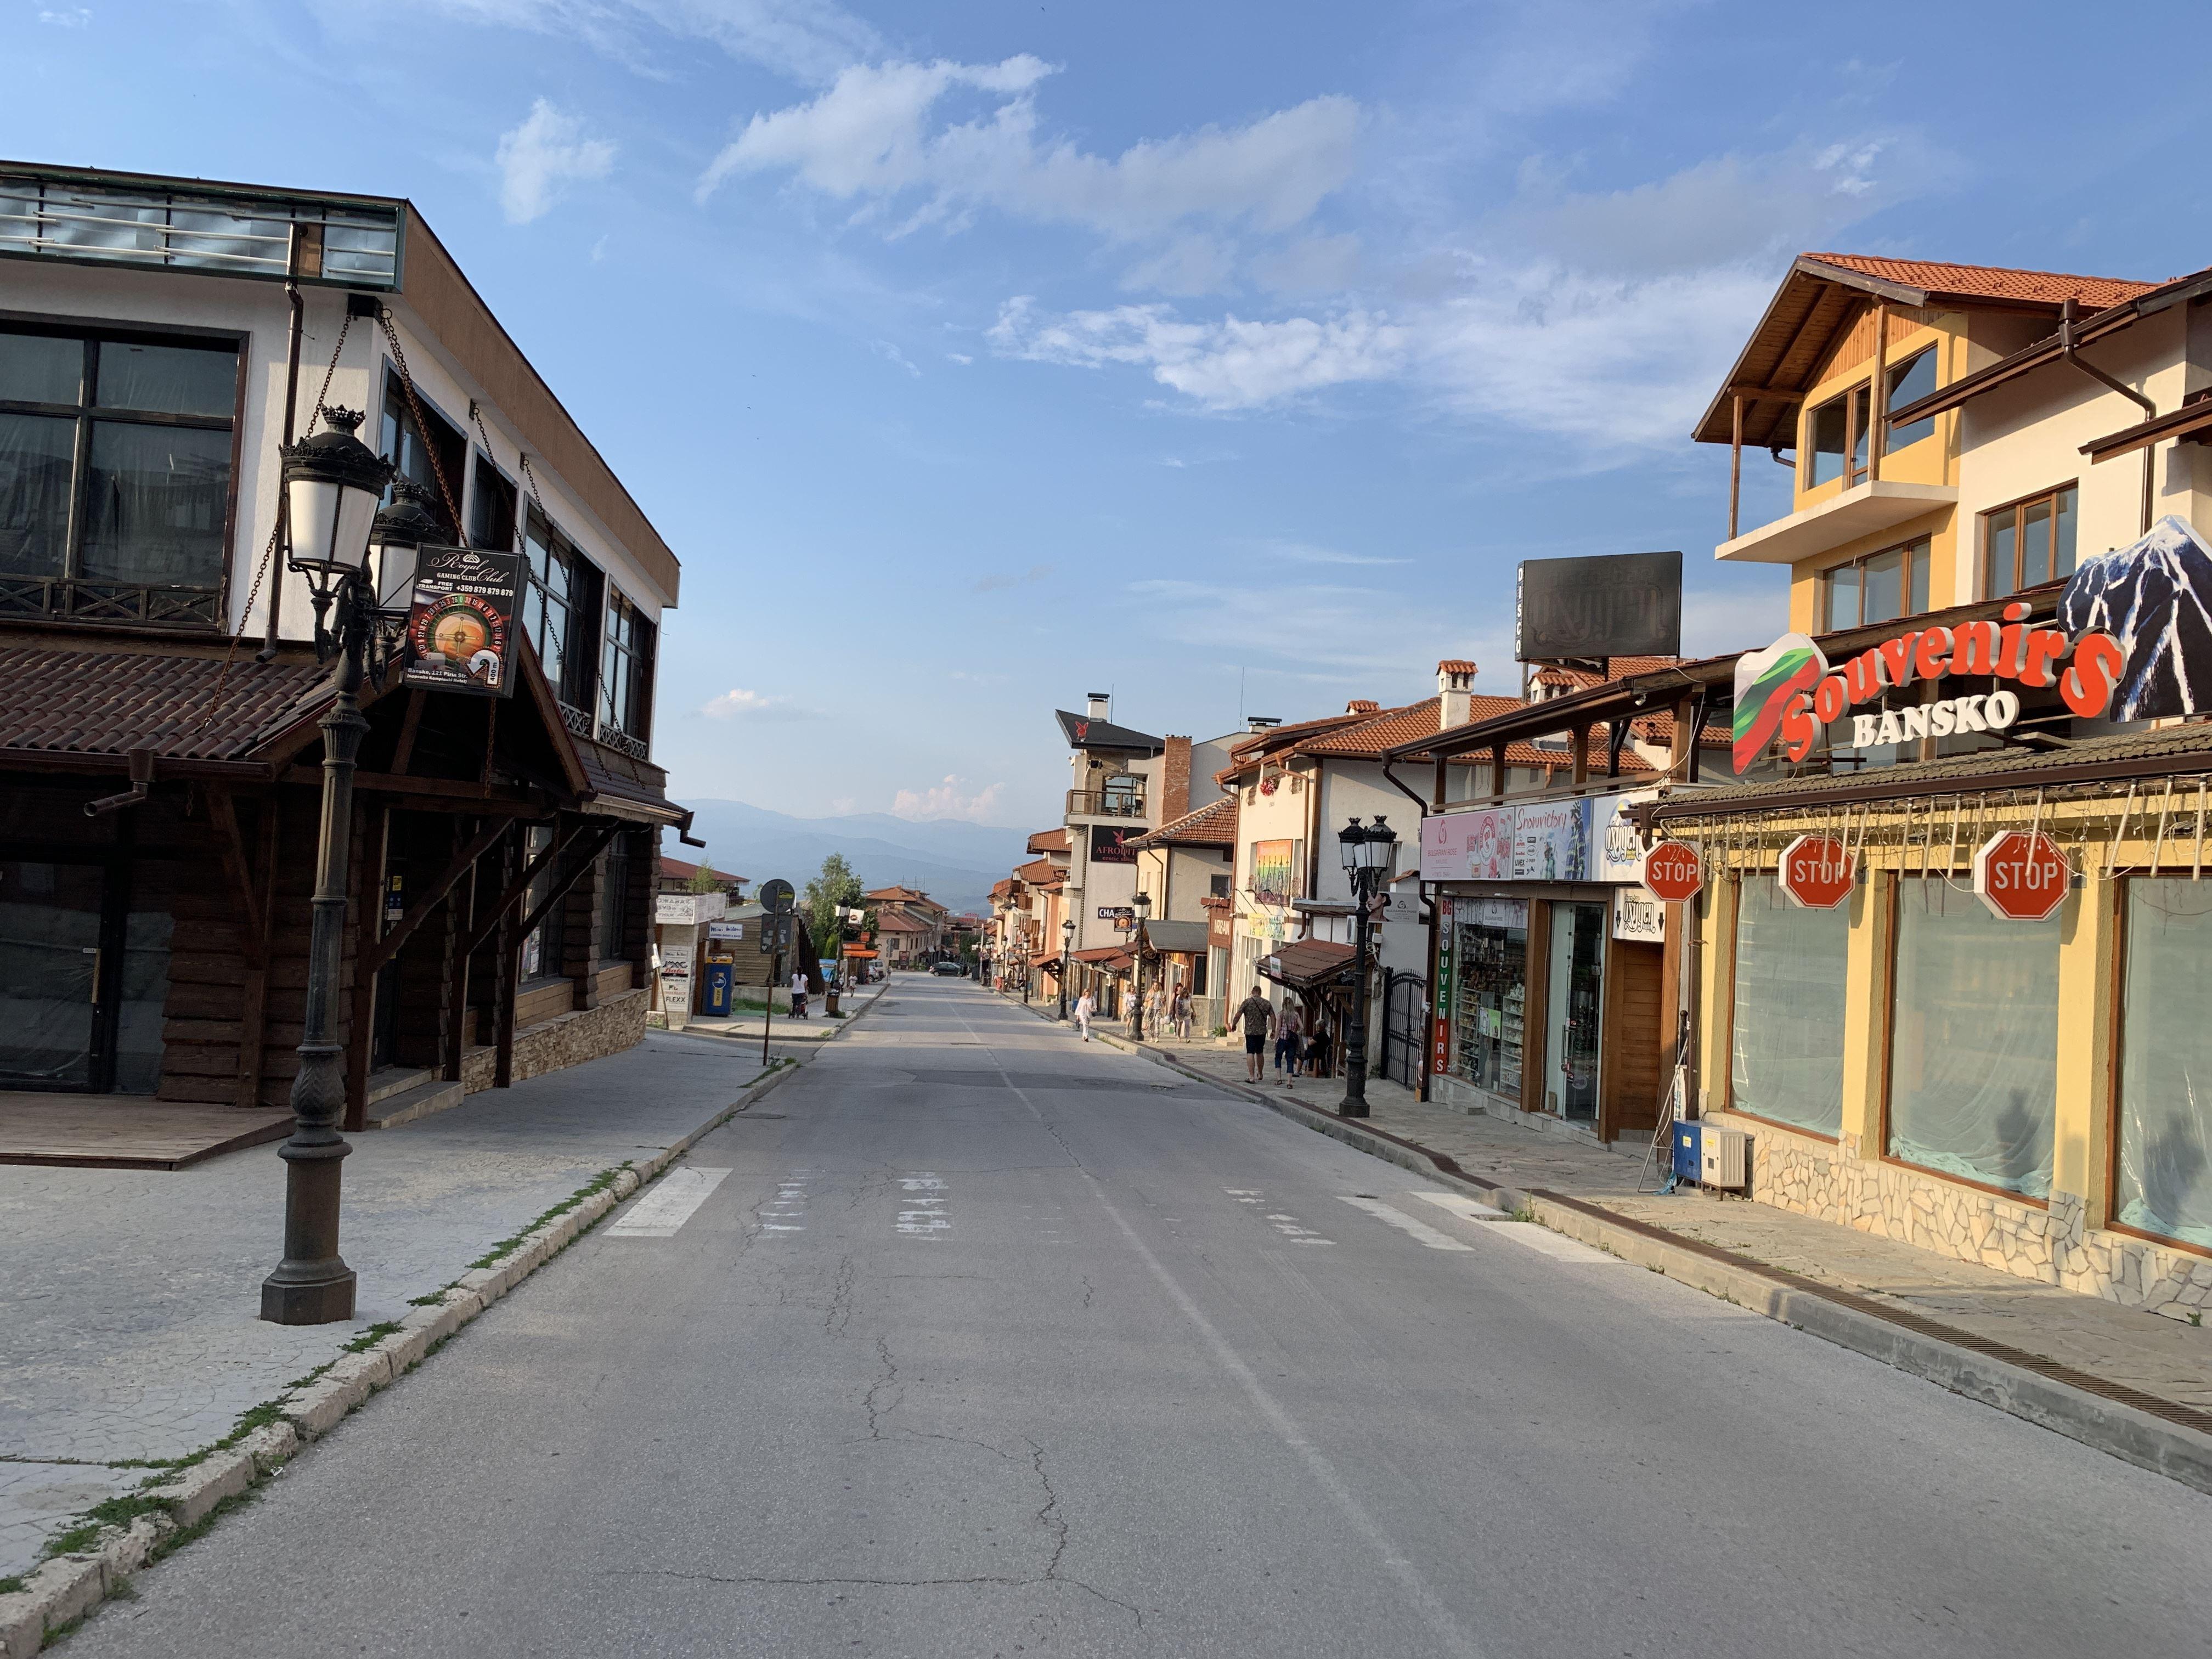 Bansko Bulgaria Empty Summer Streets Near Gondola